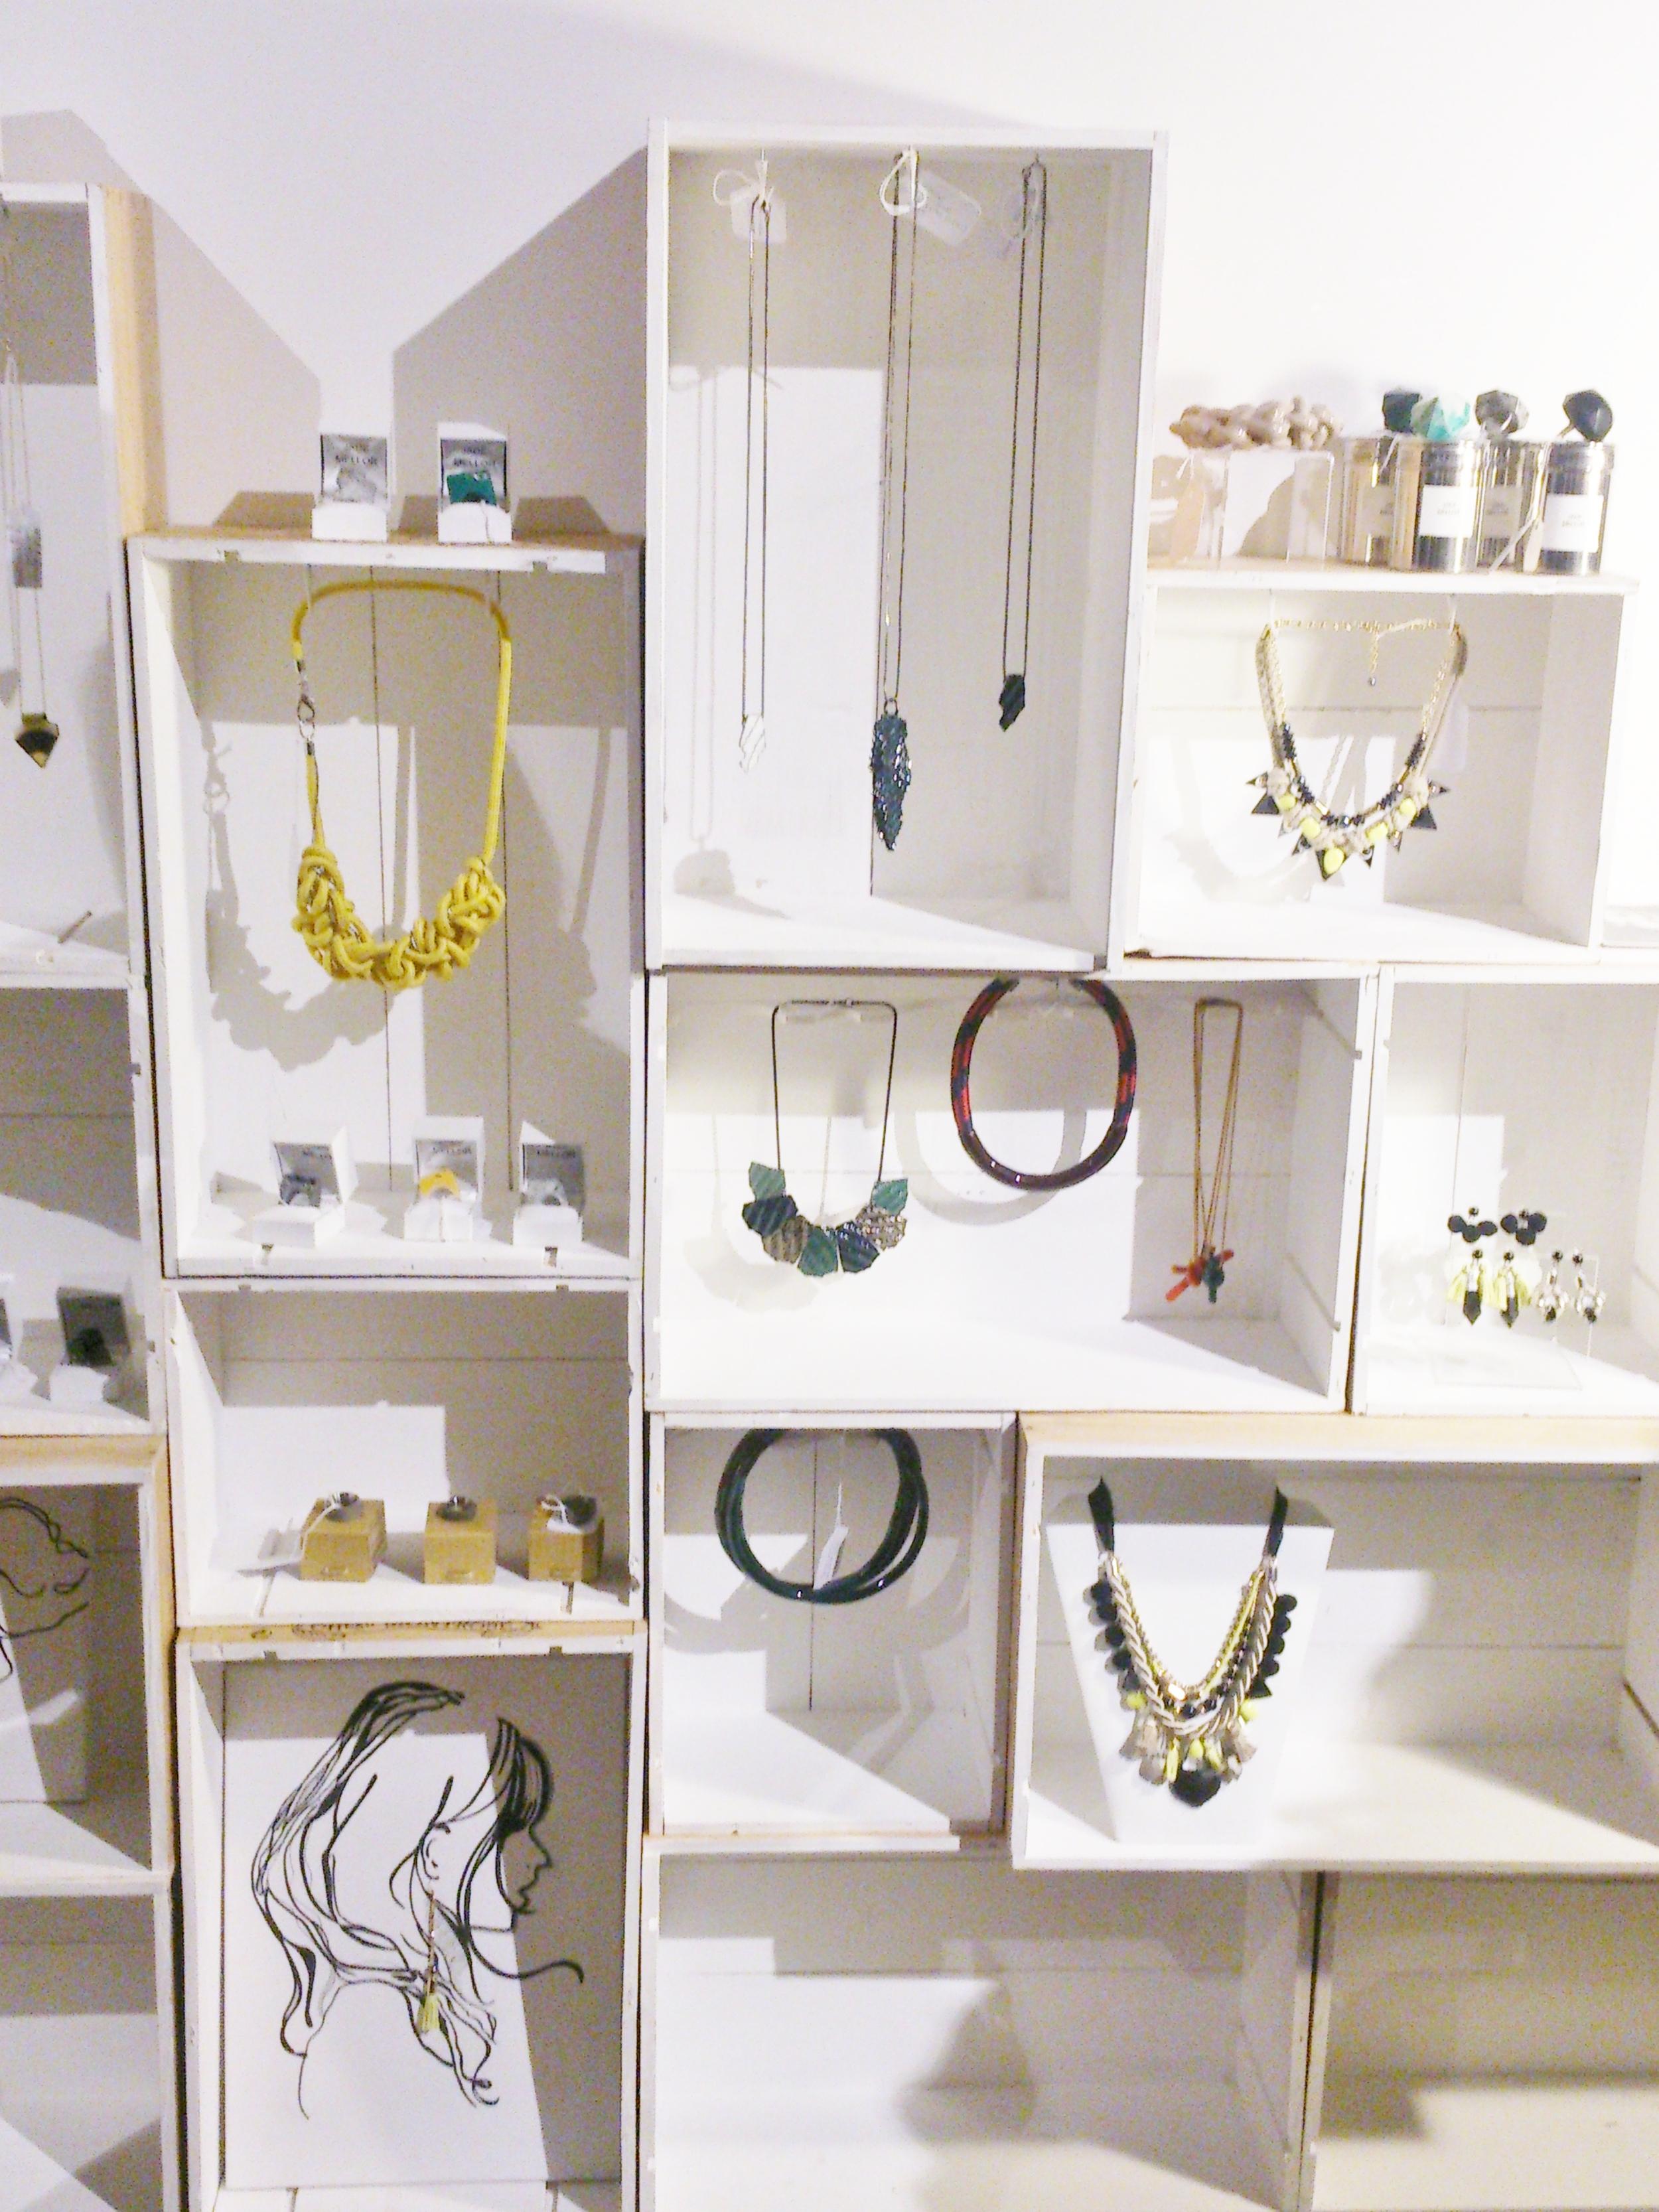 jade mellor shoreditch muse creative showcase somerset house startups jewellery.jpg